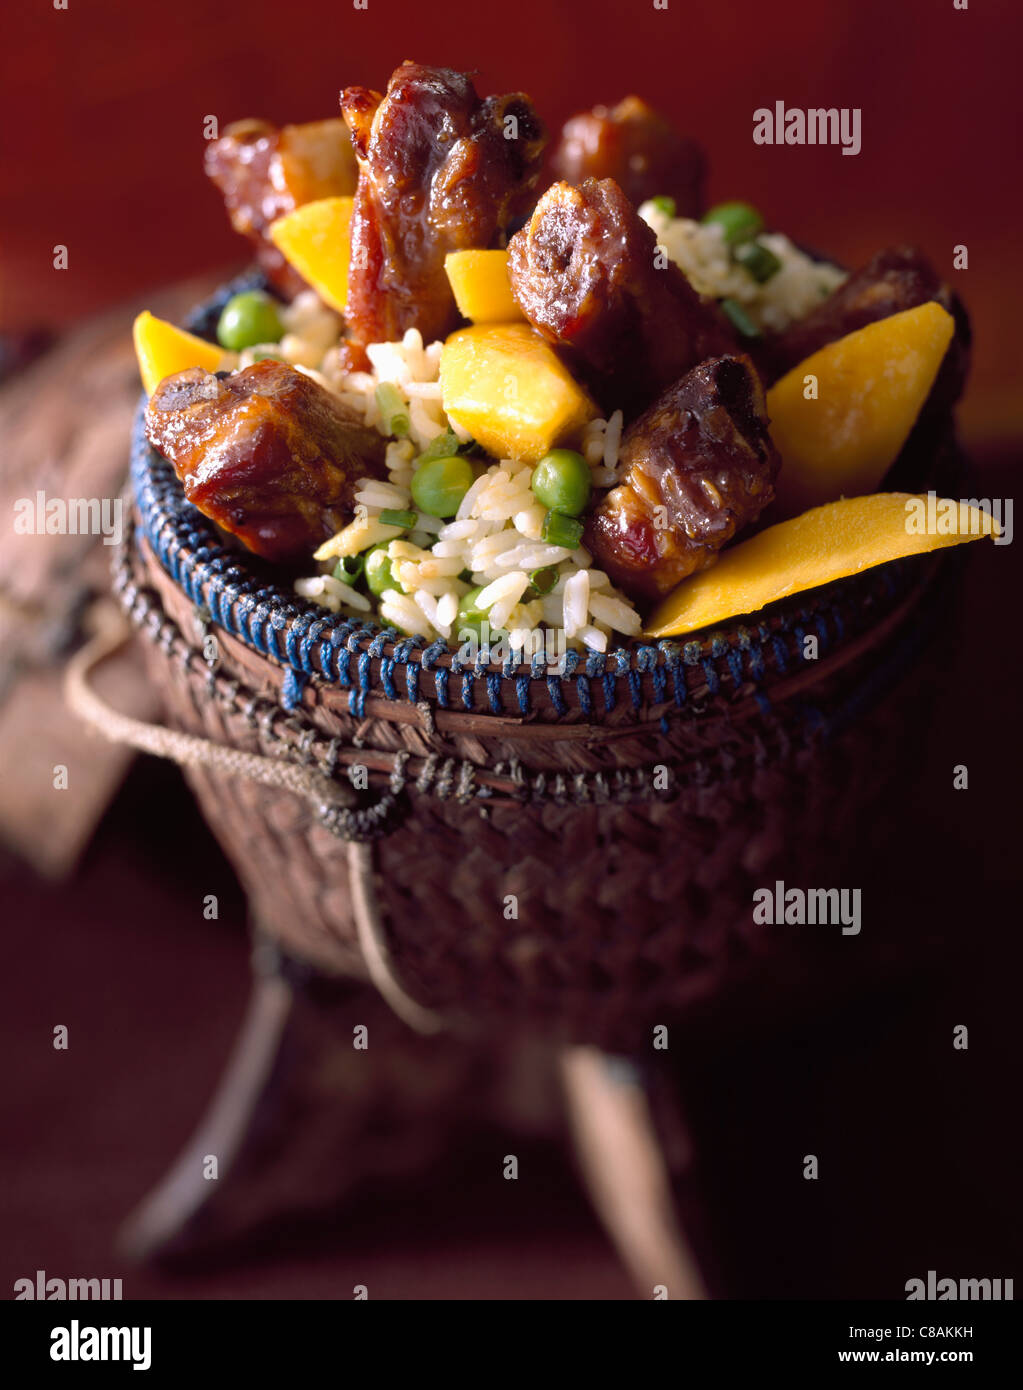 Caramelized pork spare-ribs - Stock Image